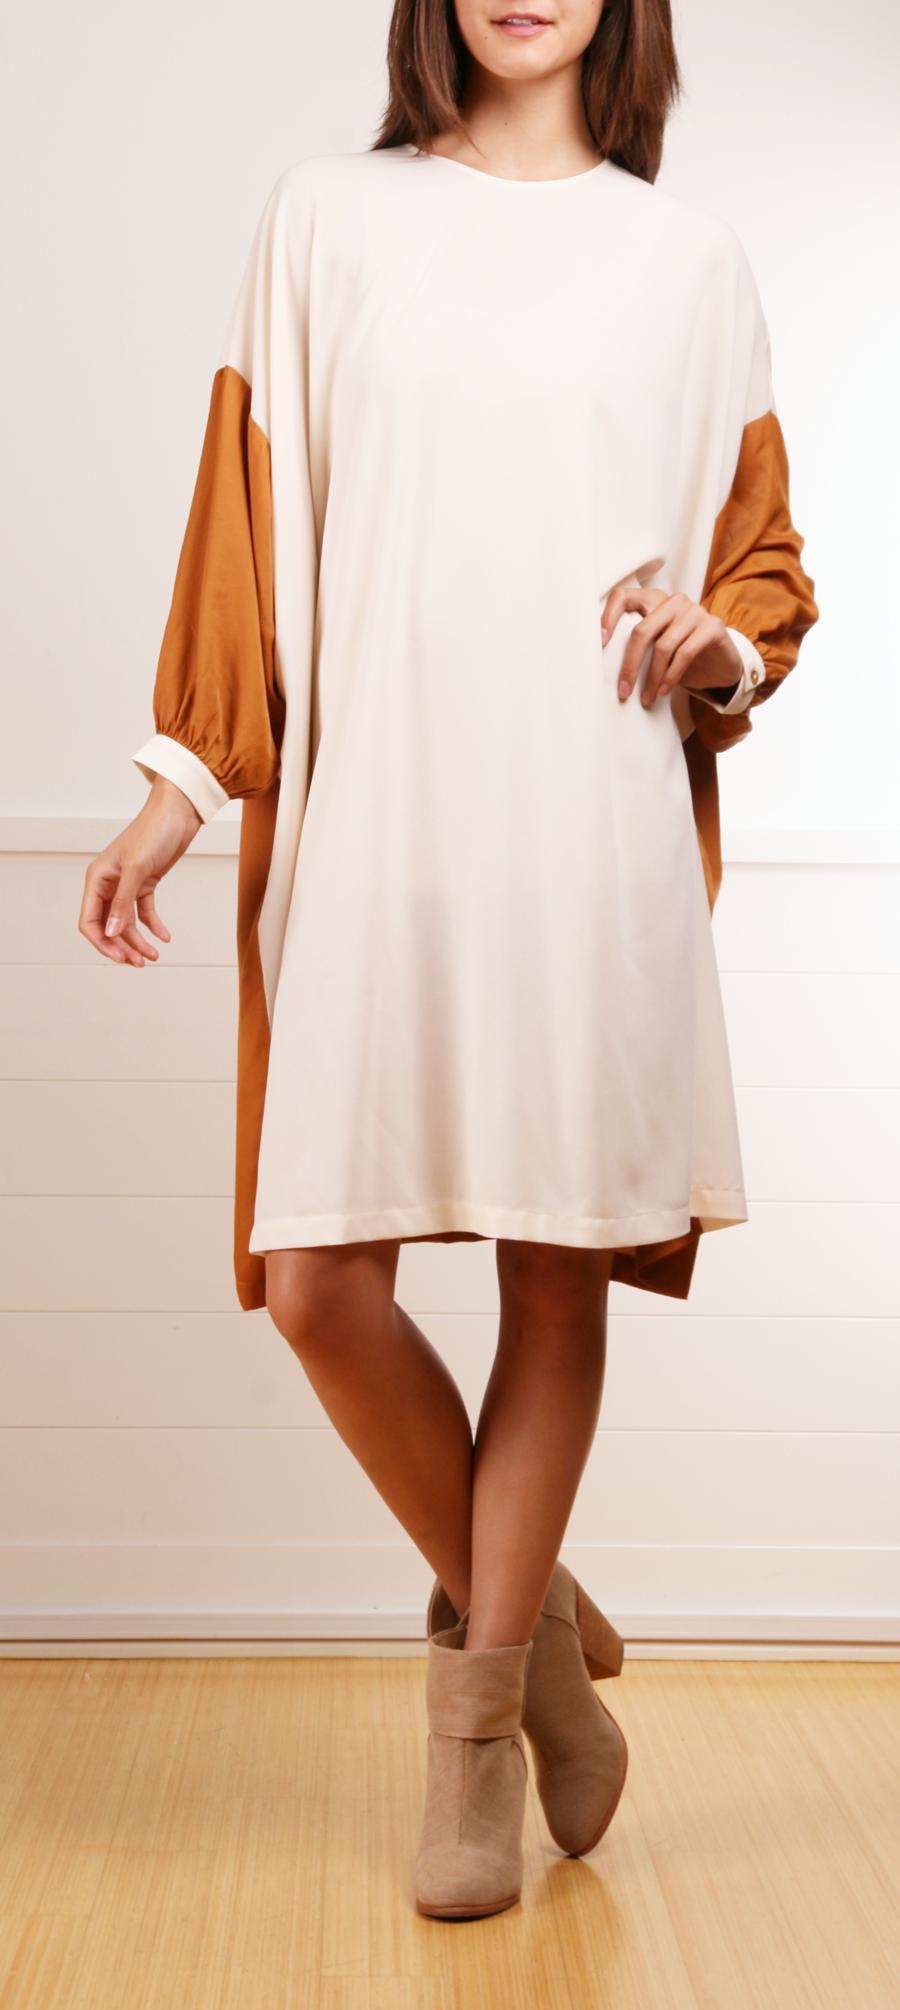 HENRIK VIBSKOV DRESS @Michelle Flynn Coleman-HERS